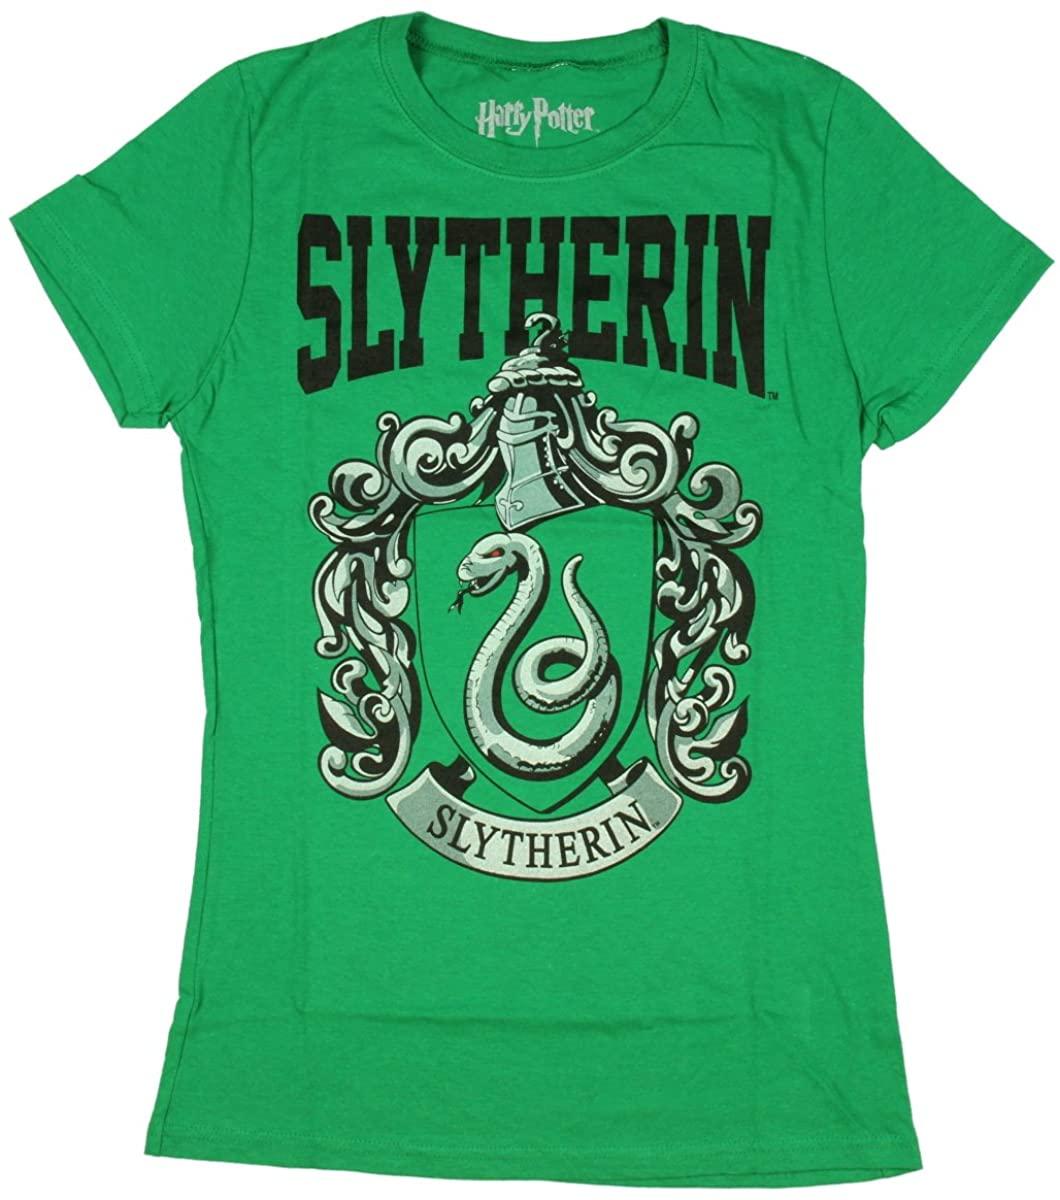 TM & Warner Brothers Entertainment Harry Potter Juniors Slytherin Short Sleeved T-Shirt (XX-Large) Green